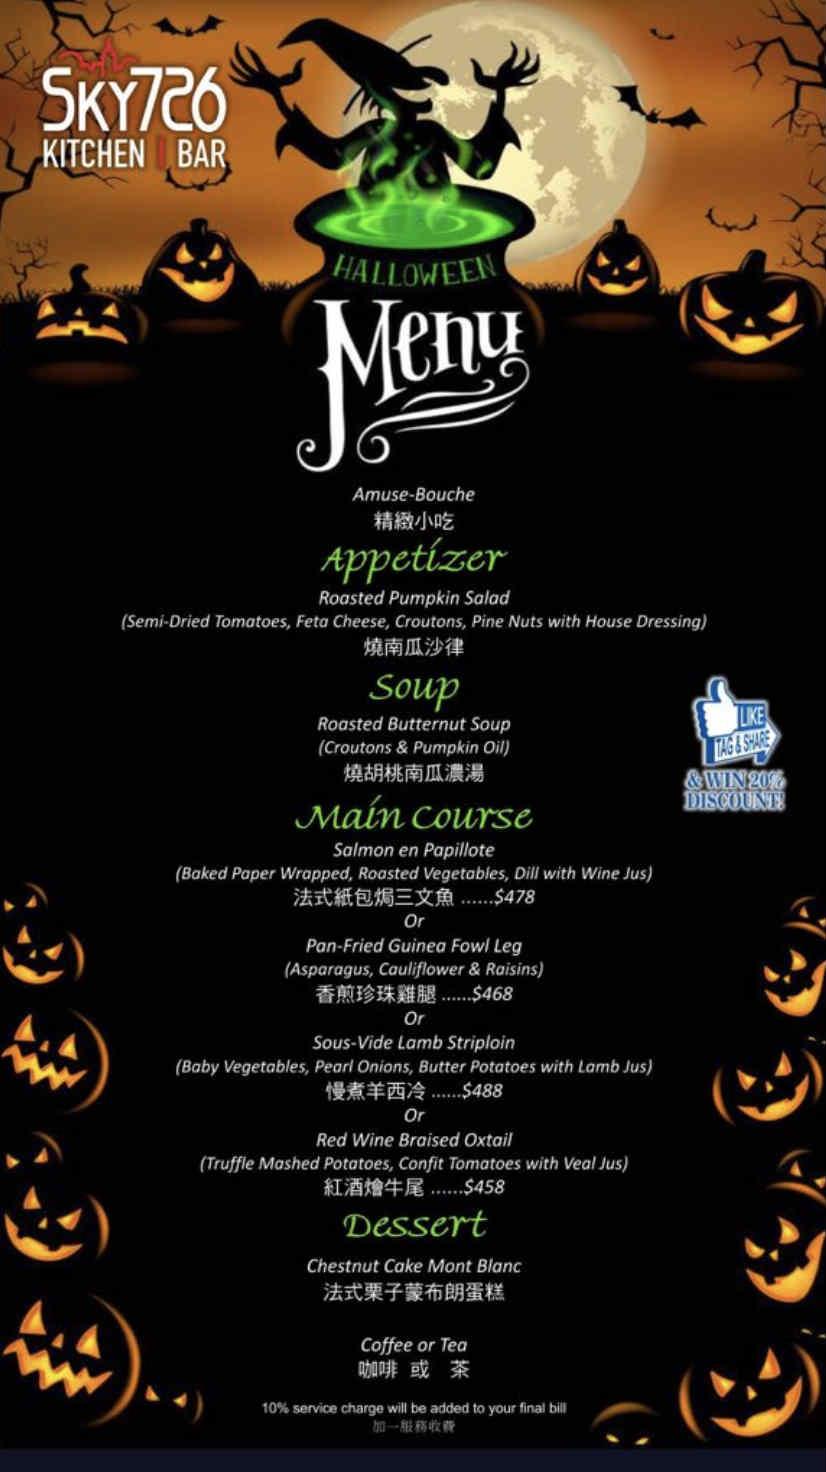 20 Best Halloween Dinner Menu Ideas For Your Restaurant